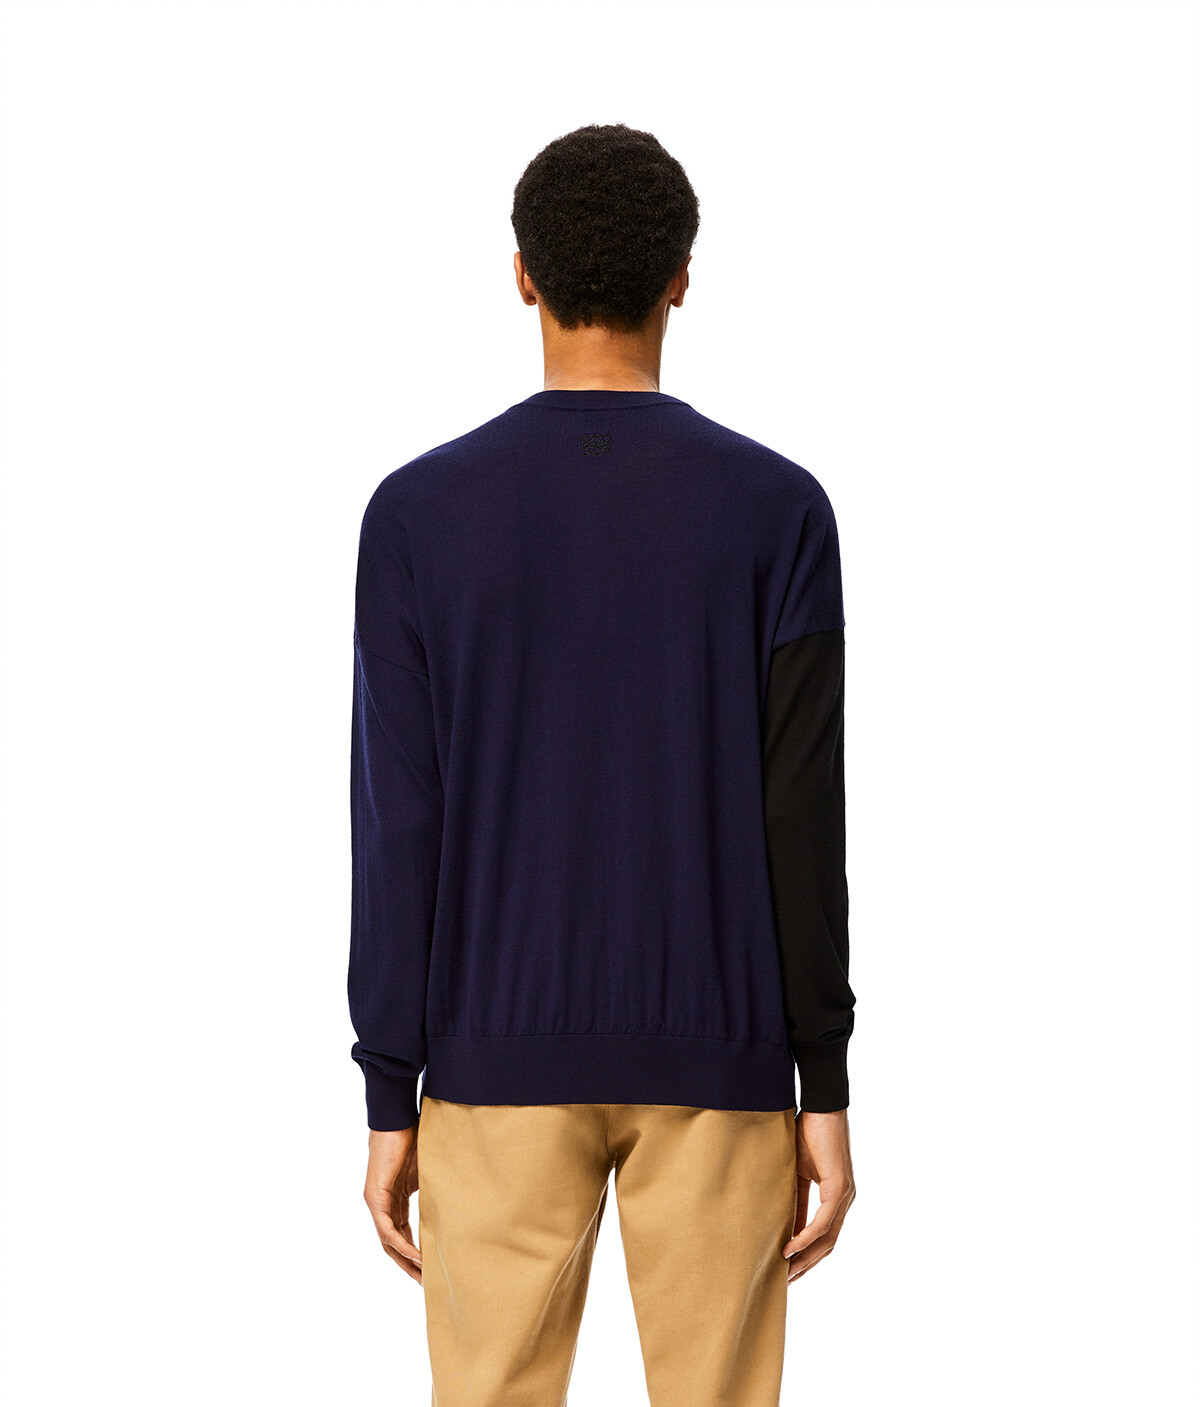 LOEWE Asymmetric Cardigan Black/Navy Blue front